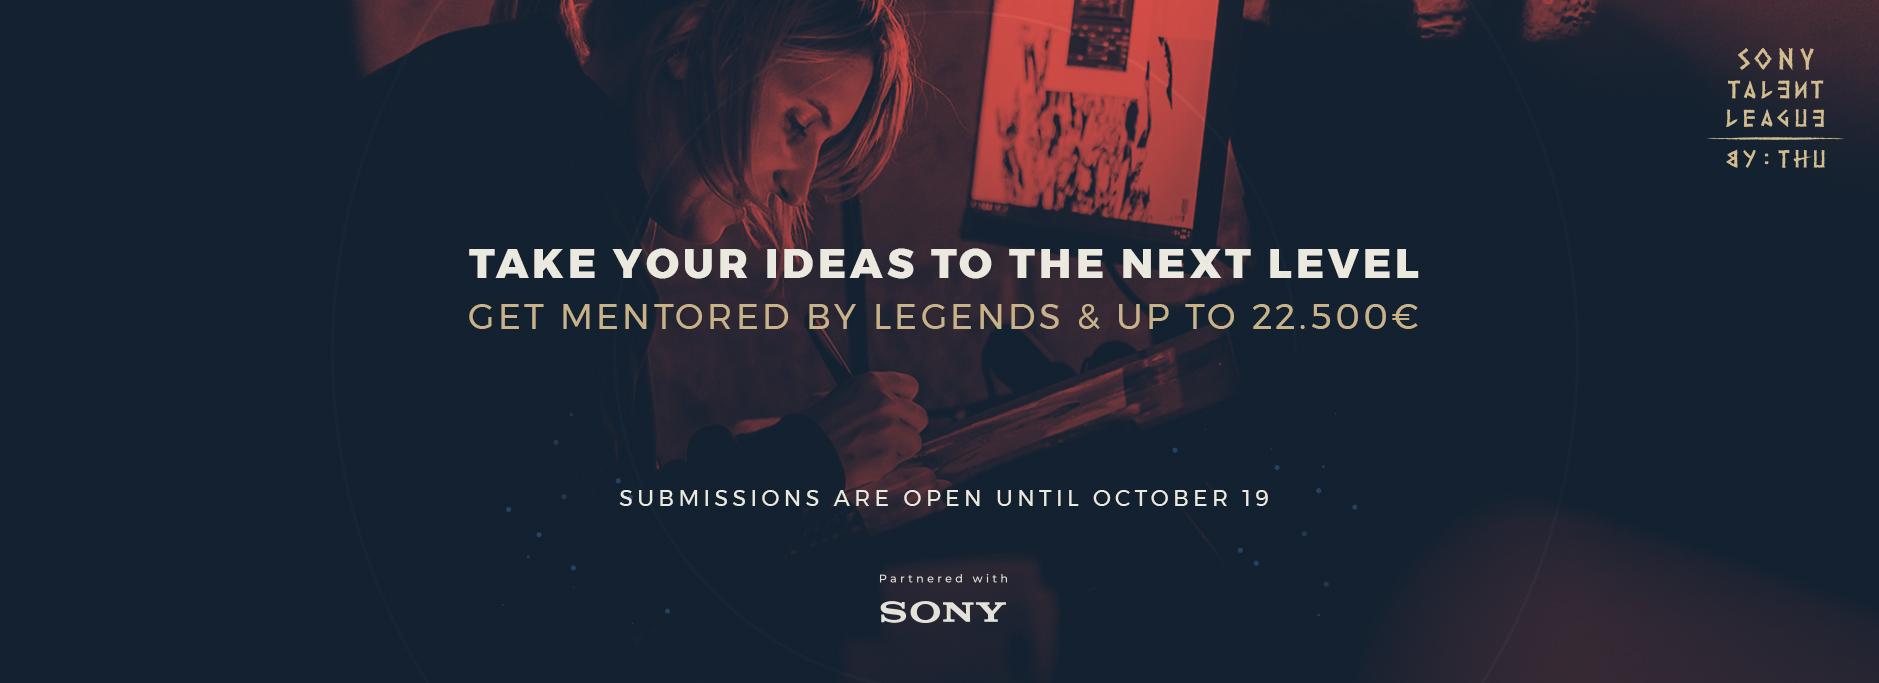 Sony Talent League